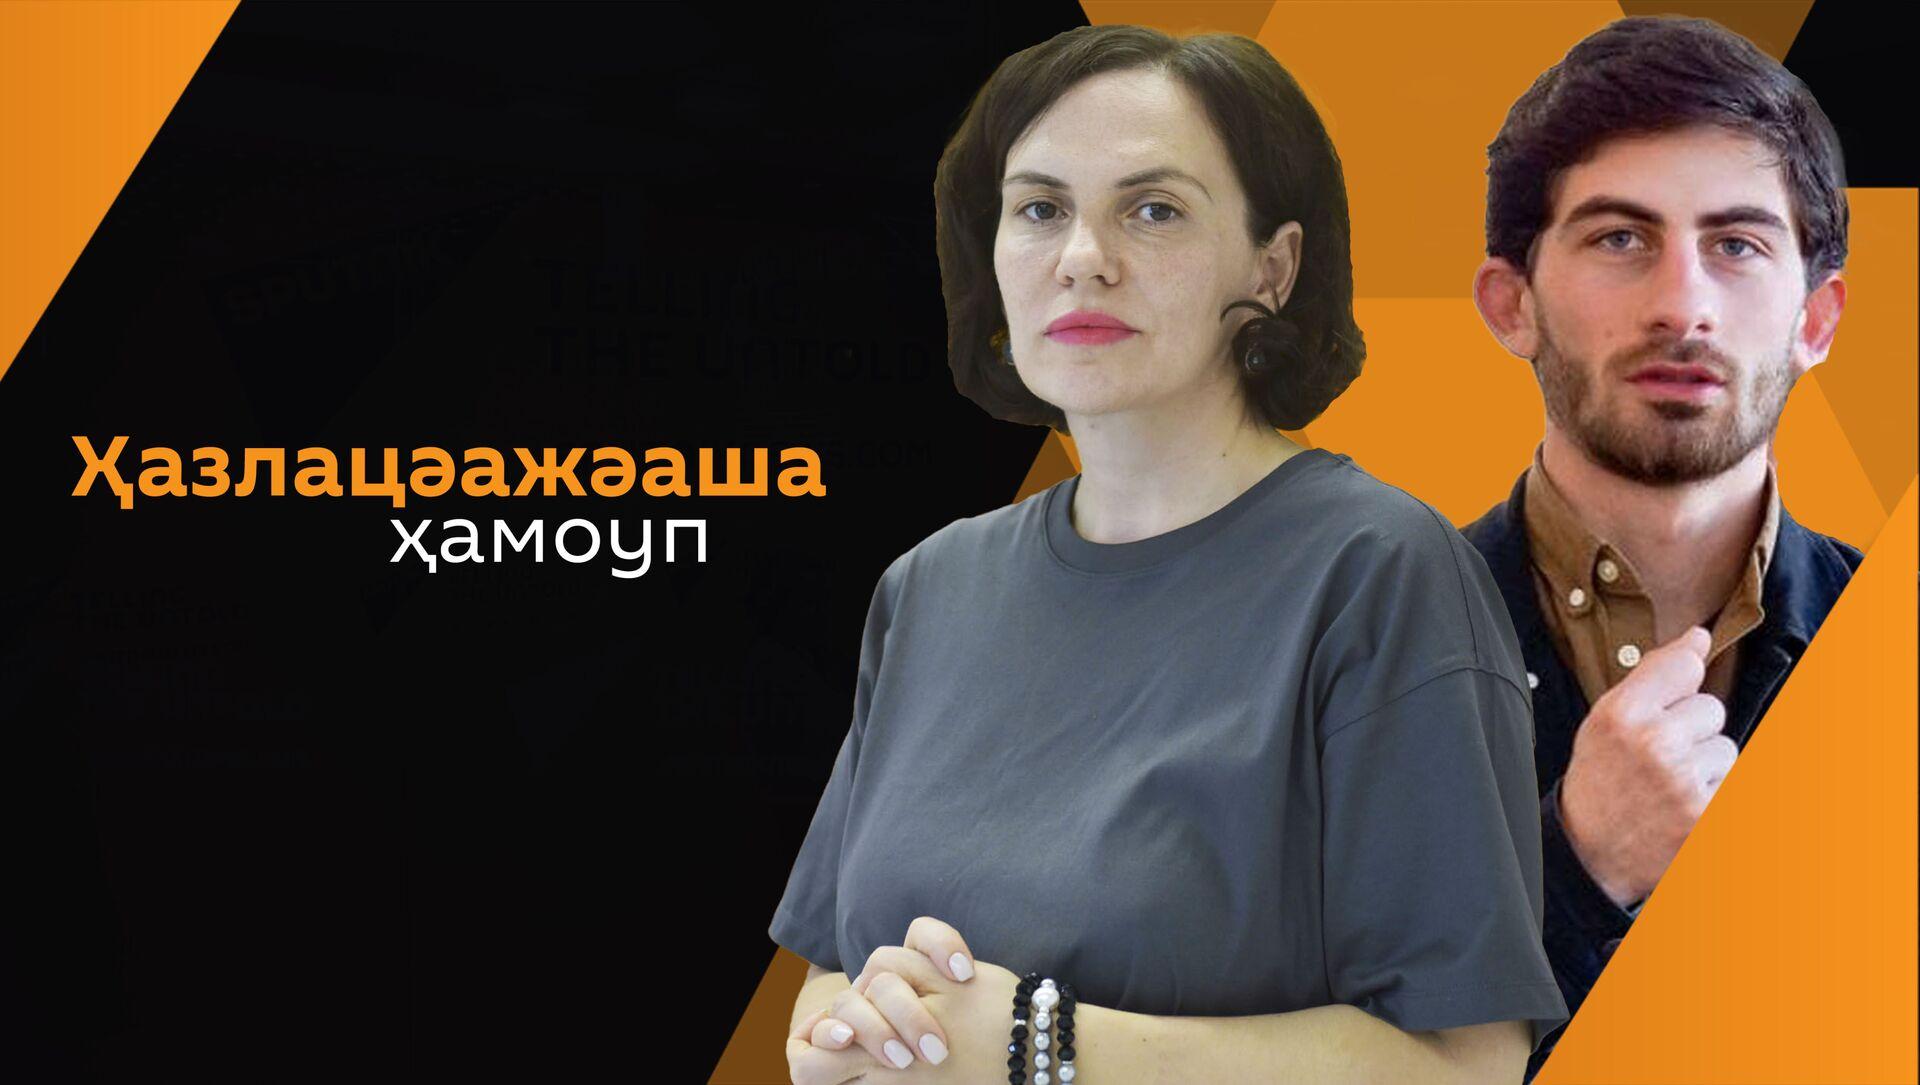 Ҳазлацәажәаша ҳамоуп: Арсалиаԥҳаи Аџьынџьали - Sputnik Аҧсны, 1920, 31.07.2021